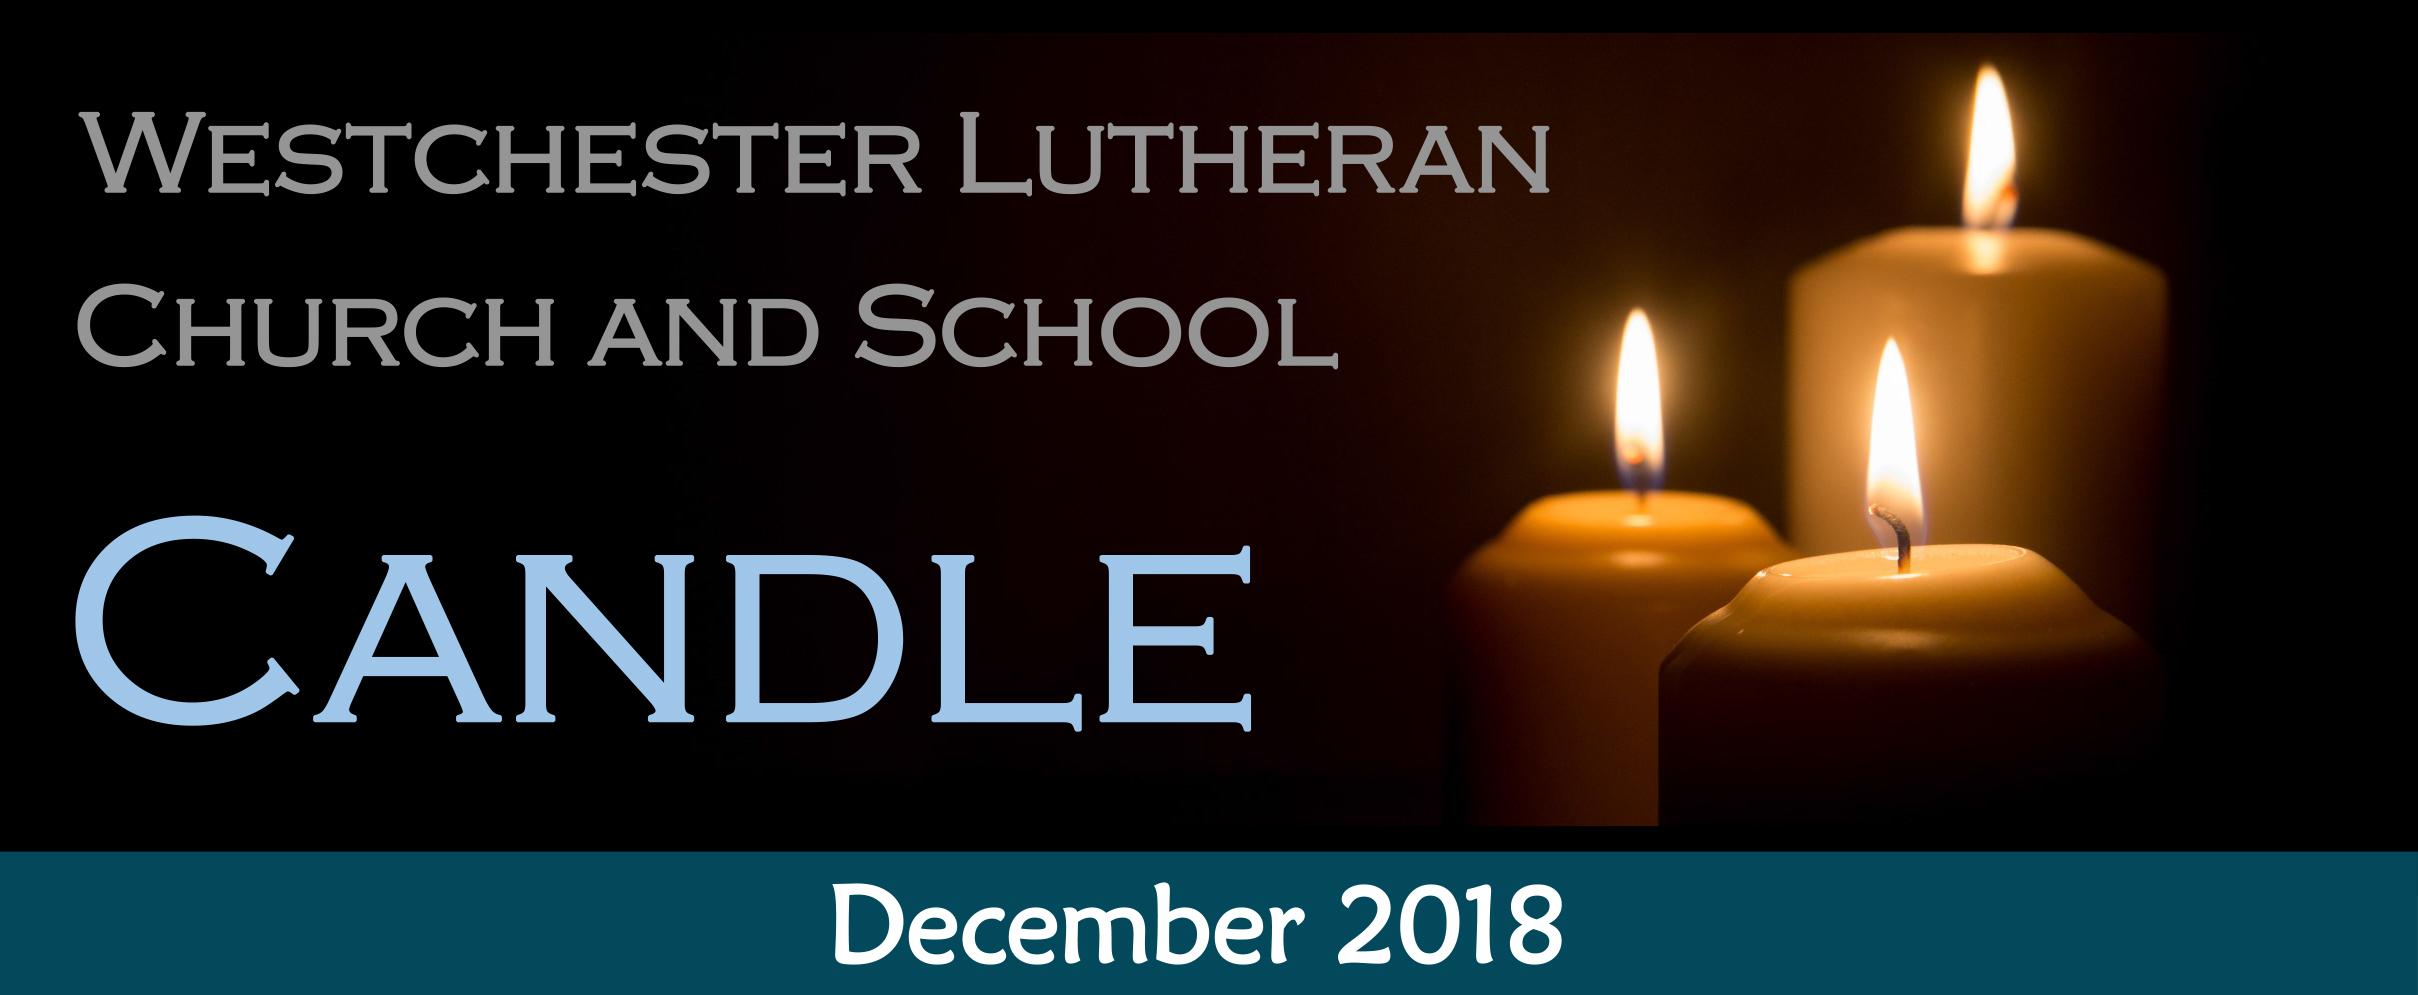 2018 December Candle- Image.jpg